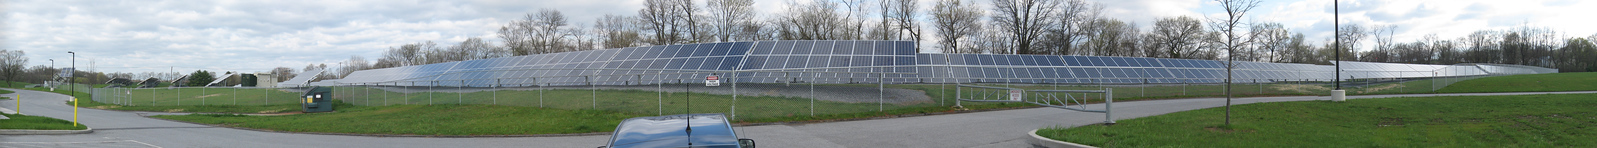 solar-stuff